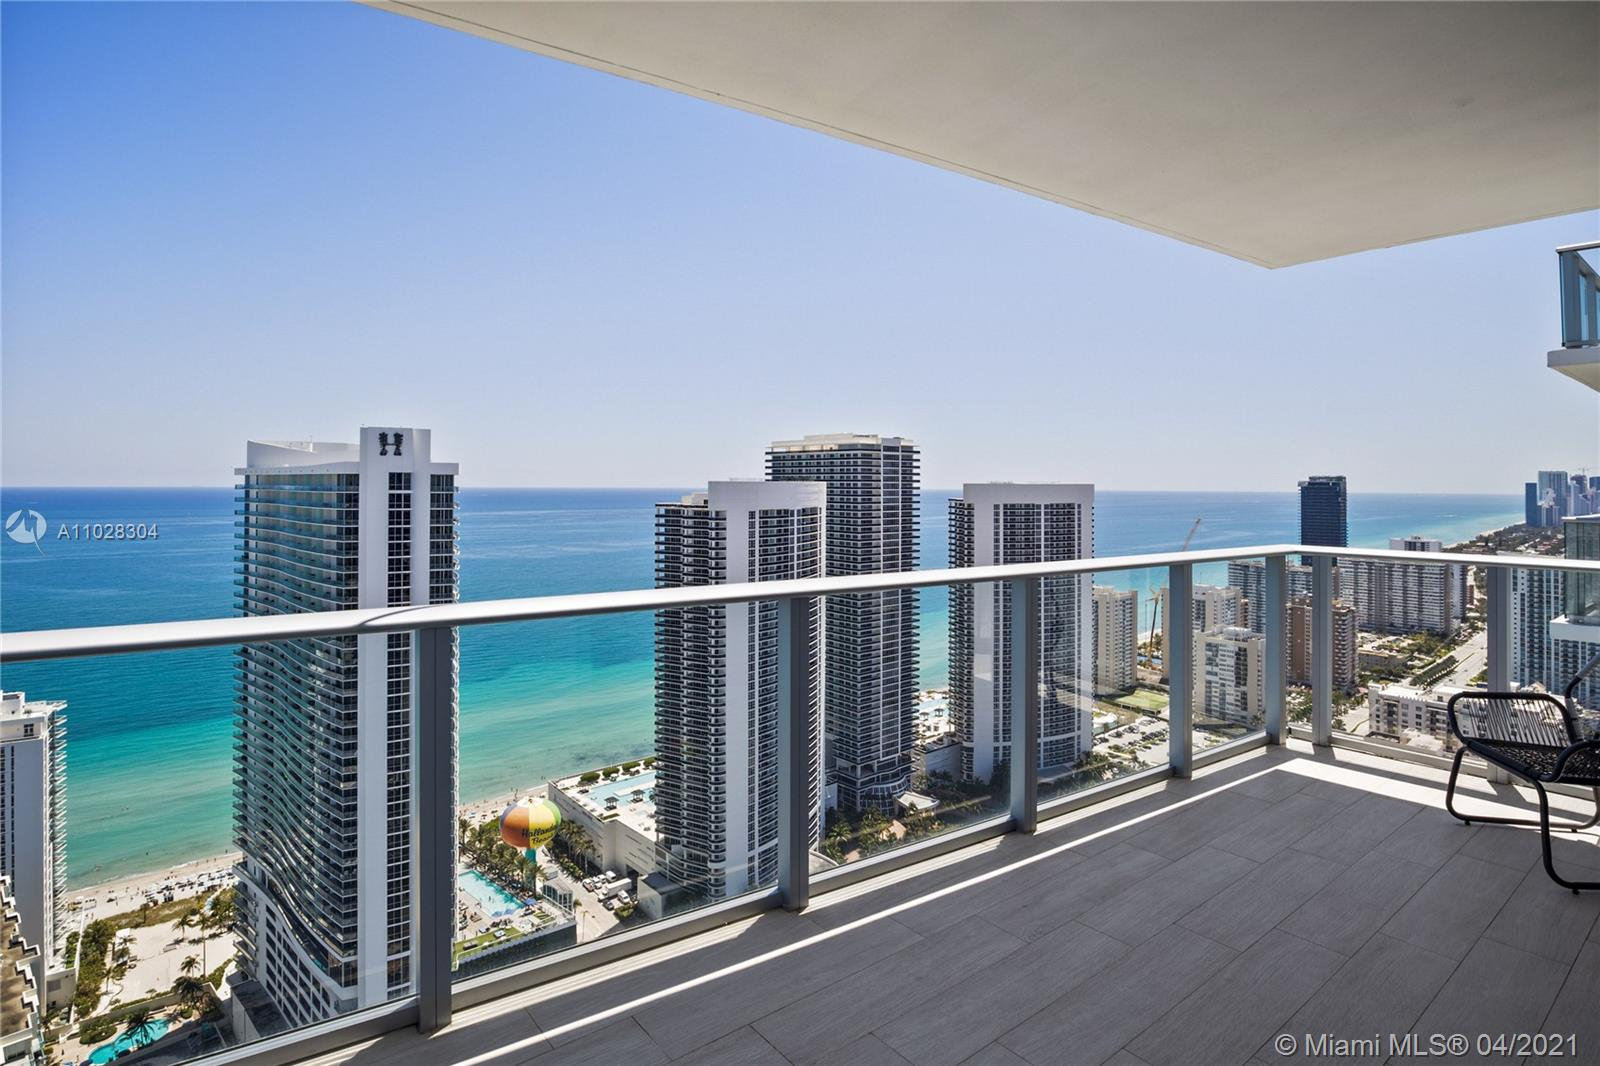 4010 S Ocean Dr T4201 Property Photo 1